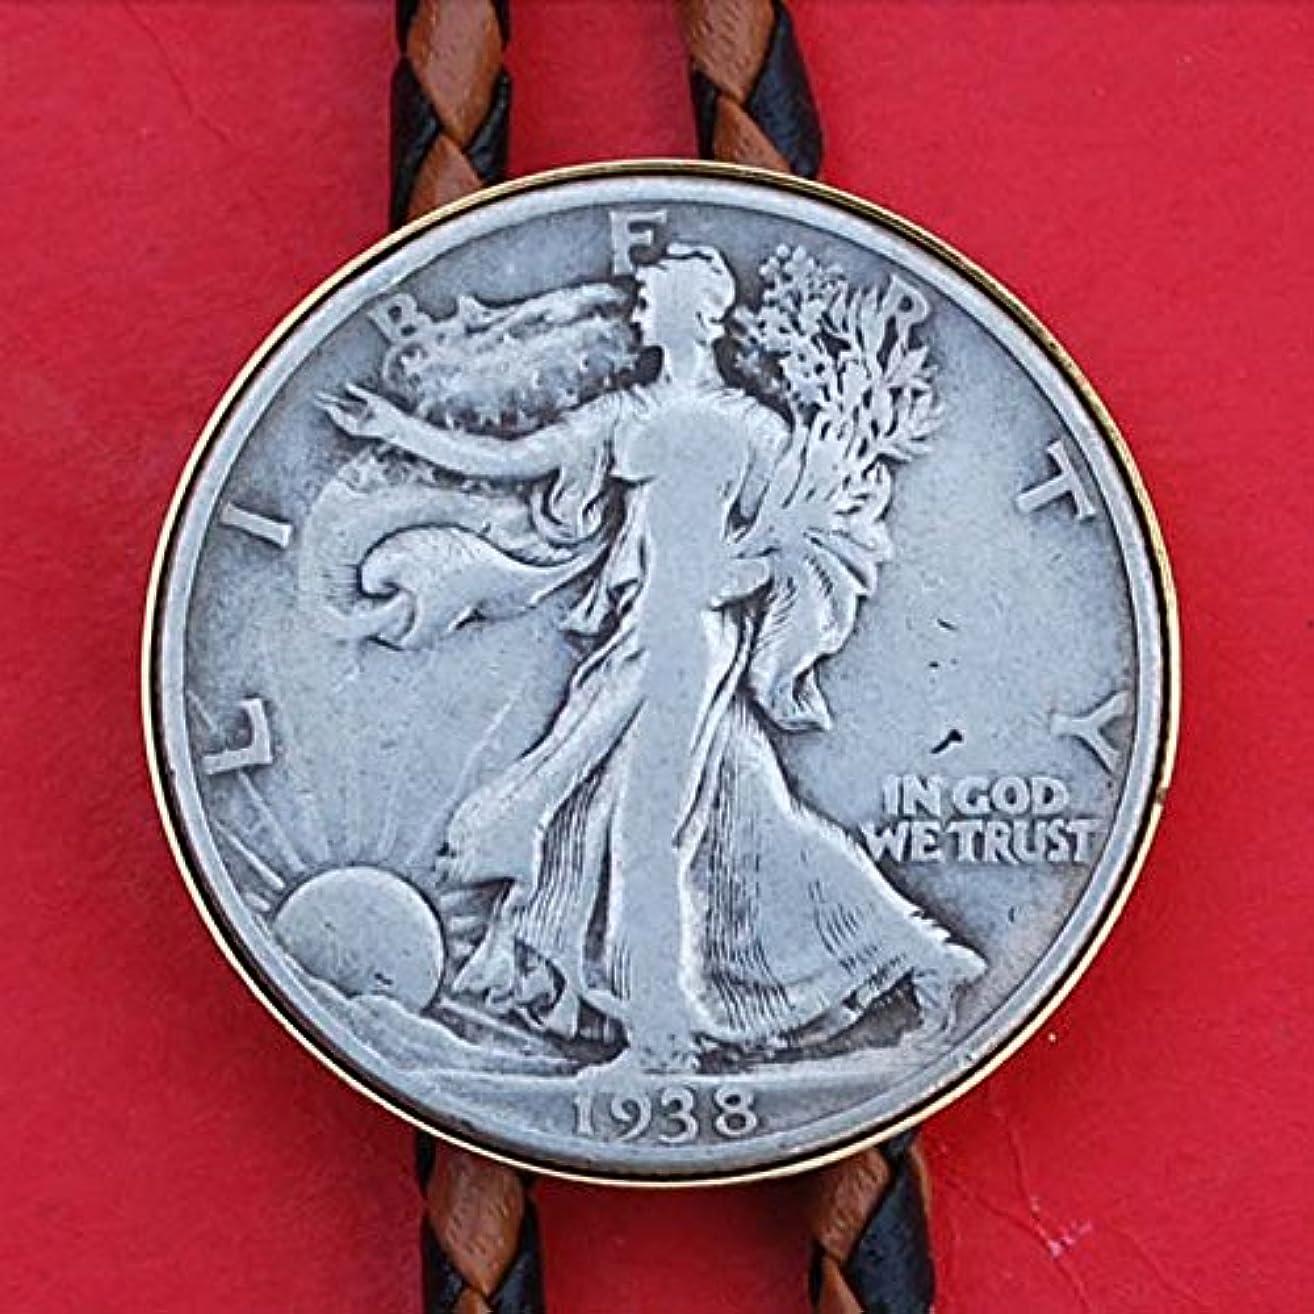 US 1938 Walking Liberty Half Dollar 90% Silver Coin Simple Slide 36